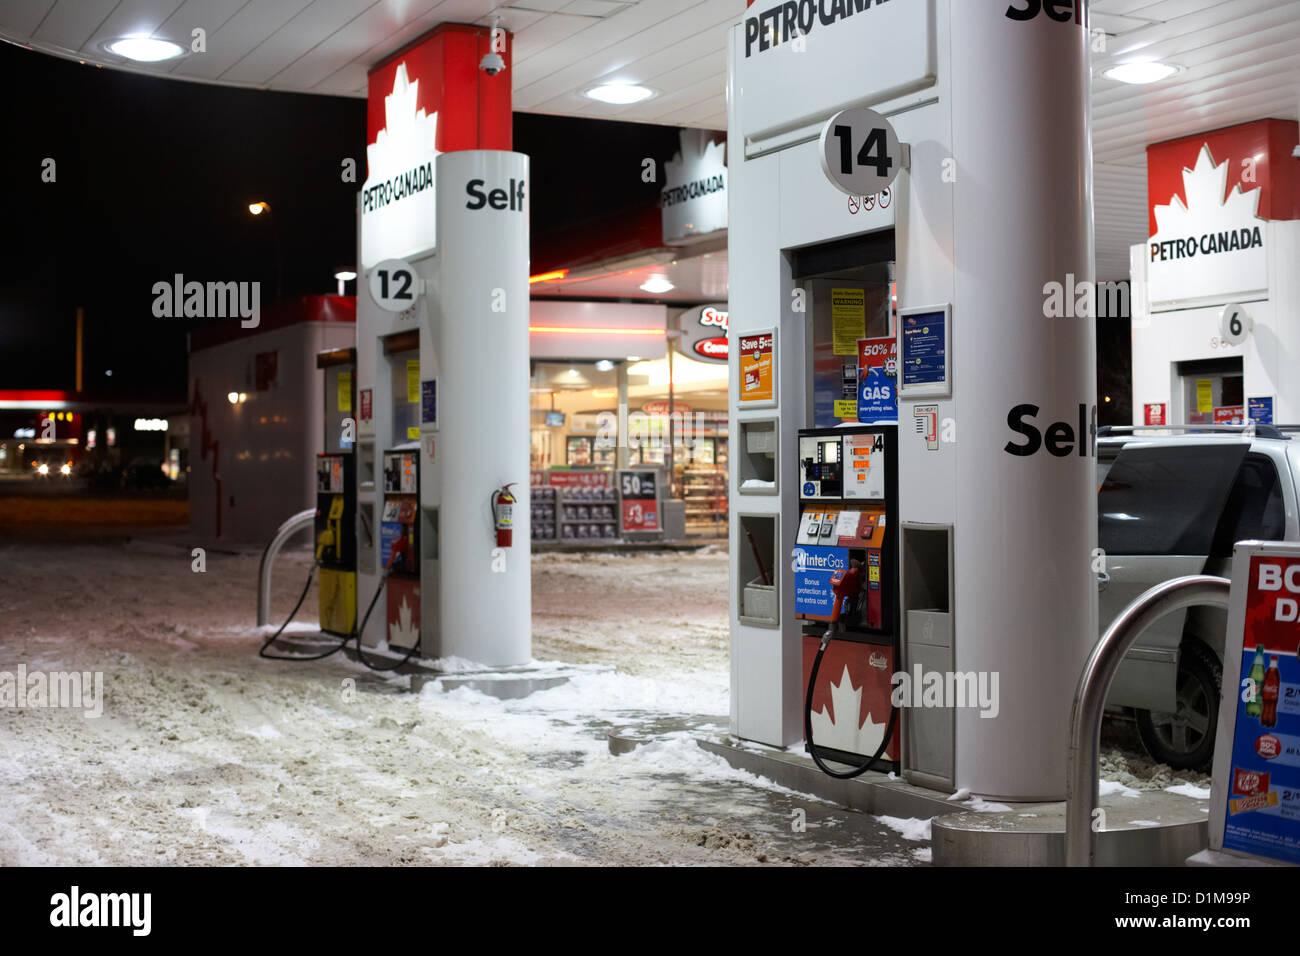 All Weather Tire >> petro canada winter gas fuel pump at service station Regina Stock Photo: 52692130 - Alamy